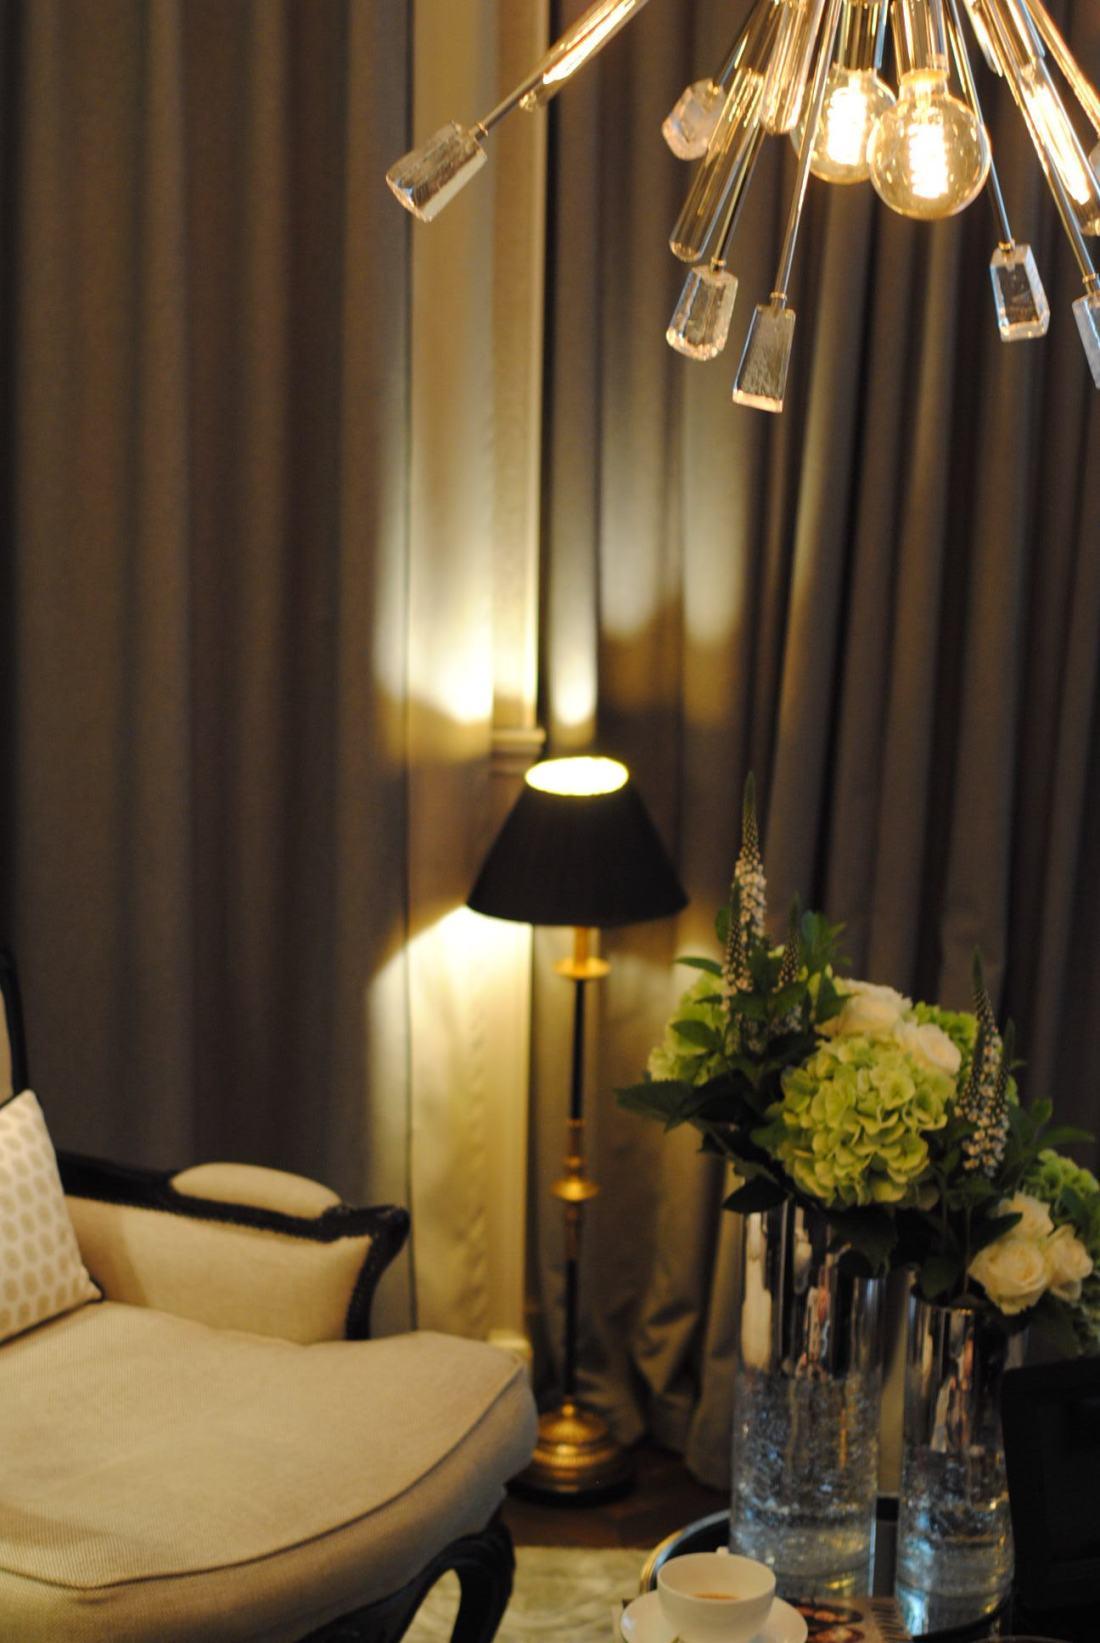 mpl-hotel-monge-lights-chairs-design-paris